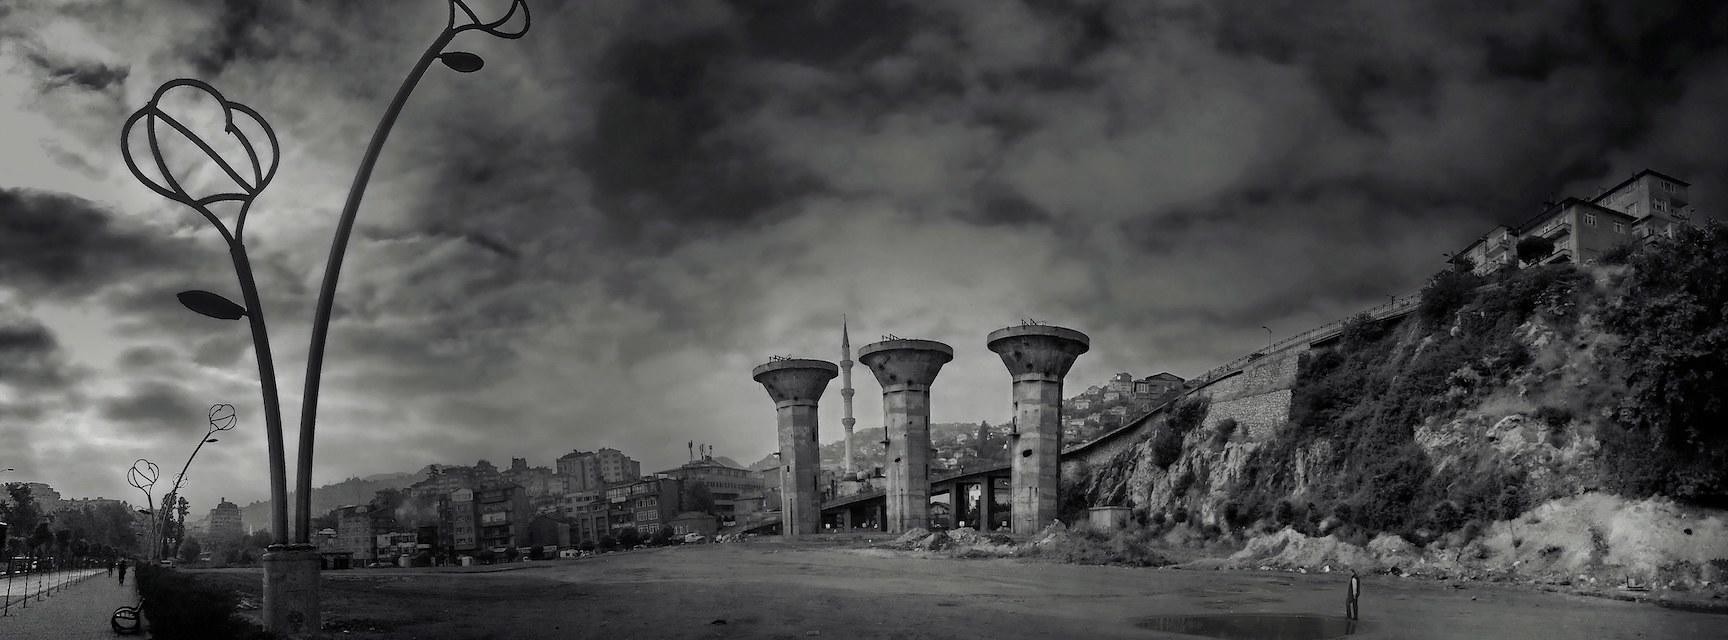 zonguldak  lavuar coal washing plant after demolition